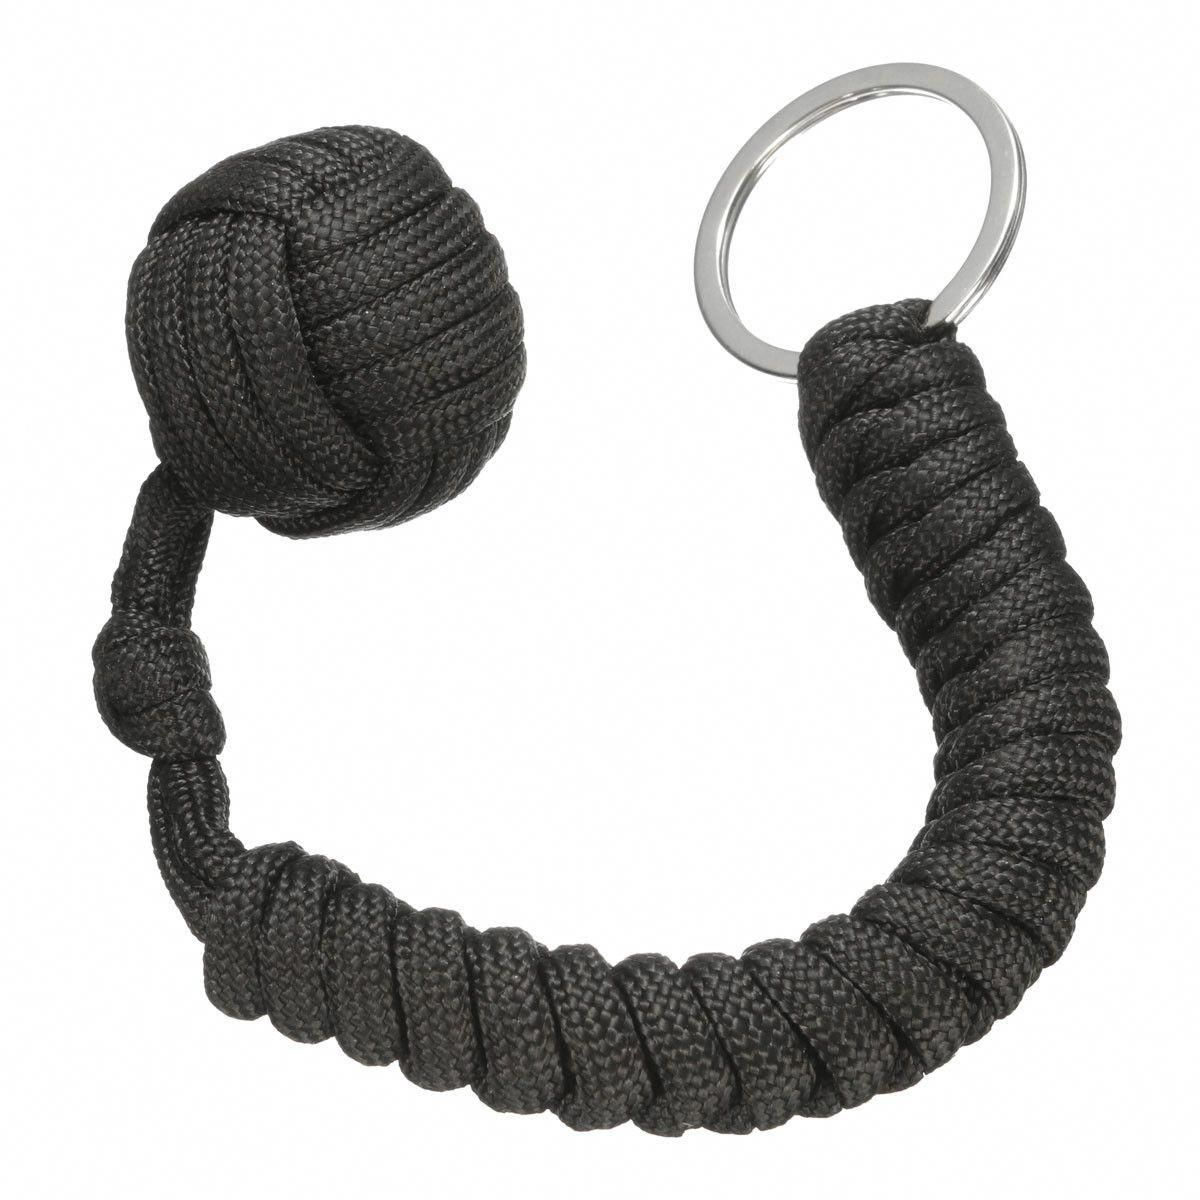 Paracord Monkey Fist Lanyard Steel Ball Self Defense (Free Shipping)   selfdefensebaton d23d4c934